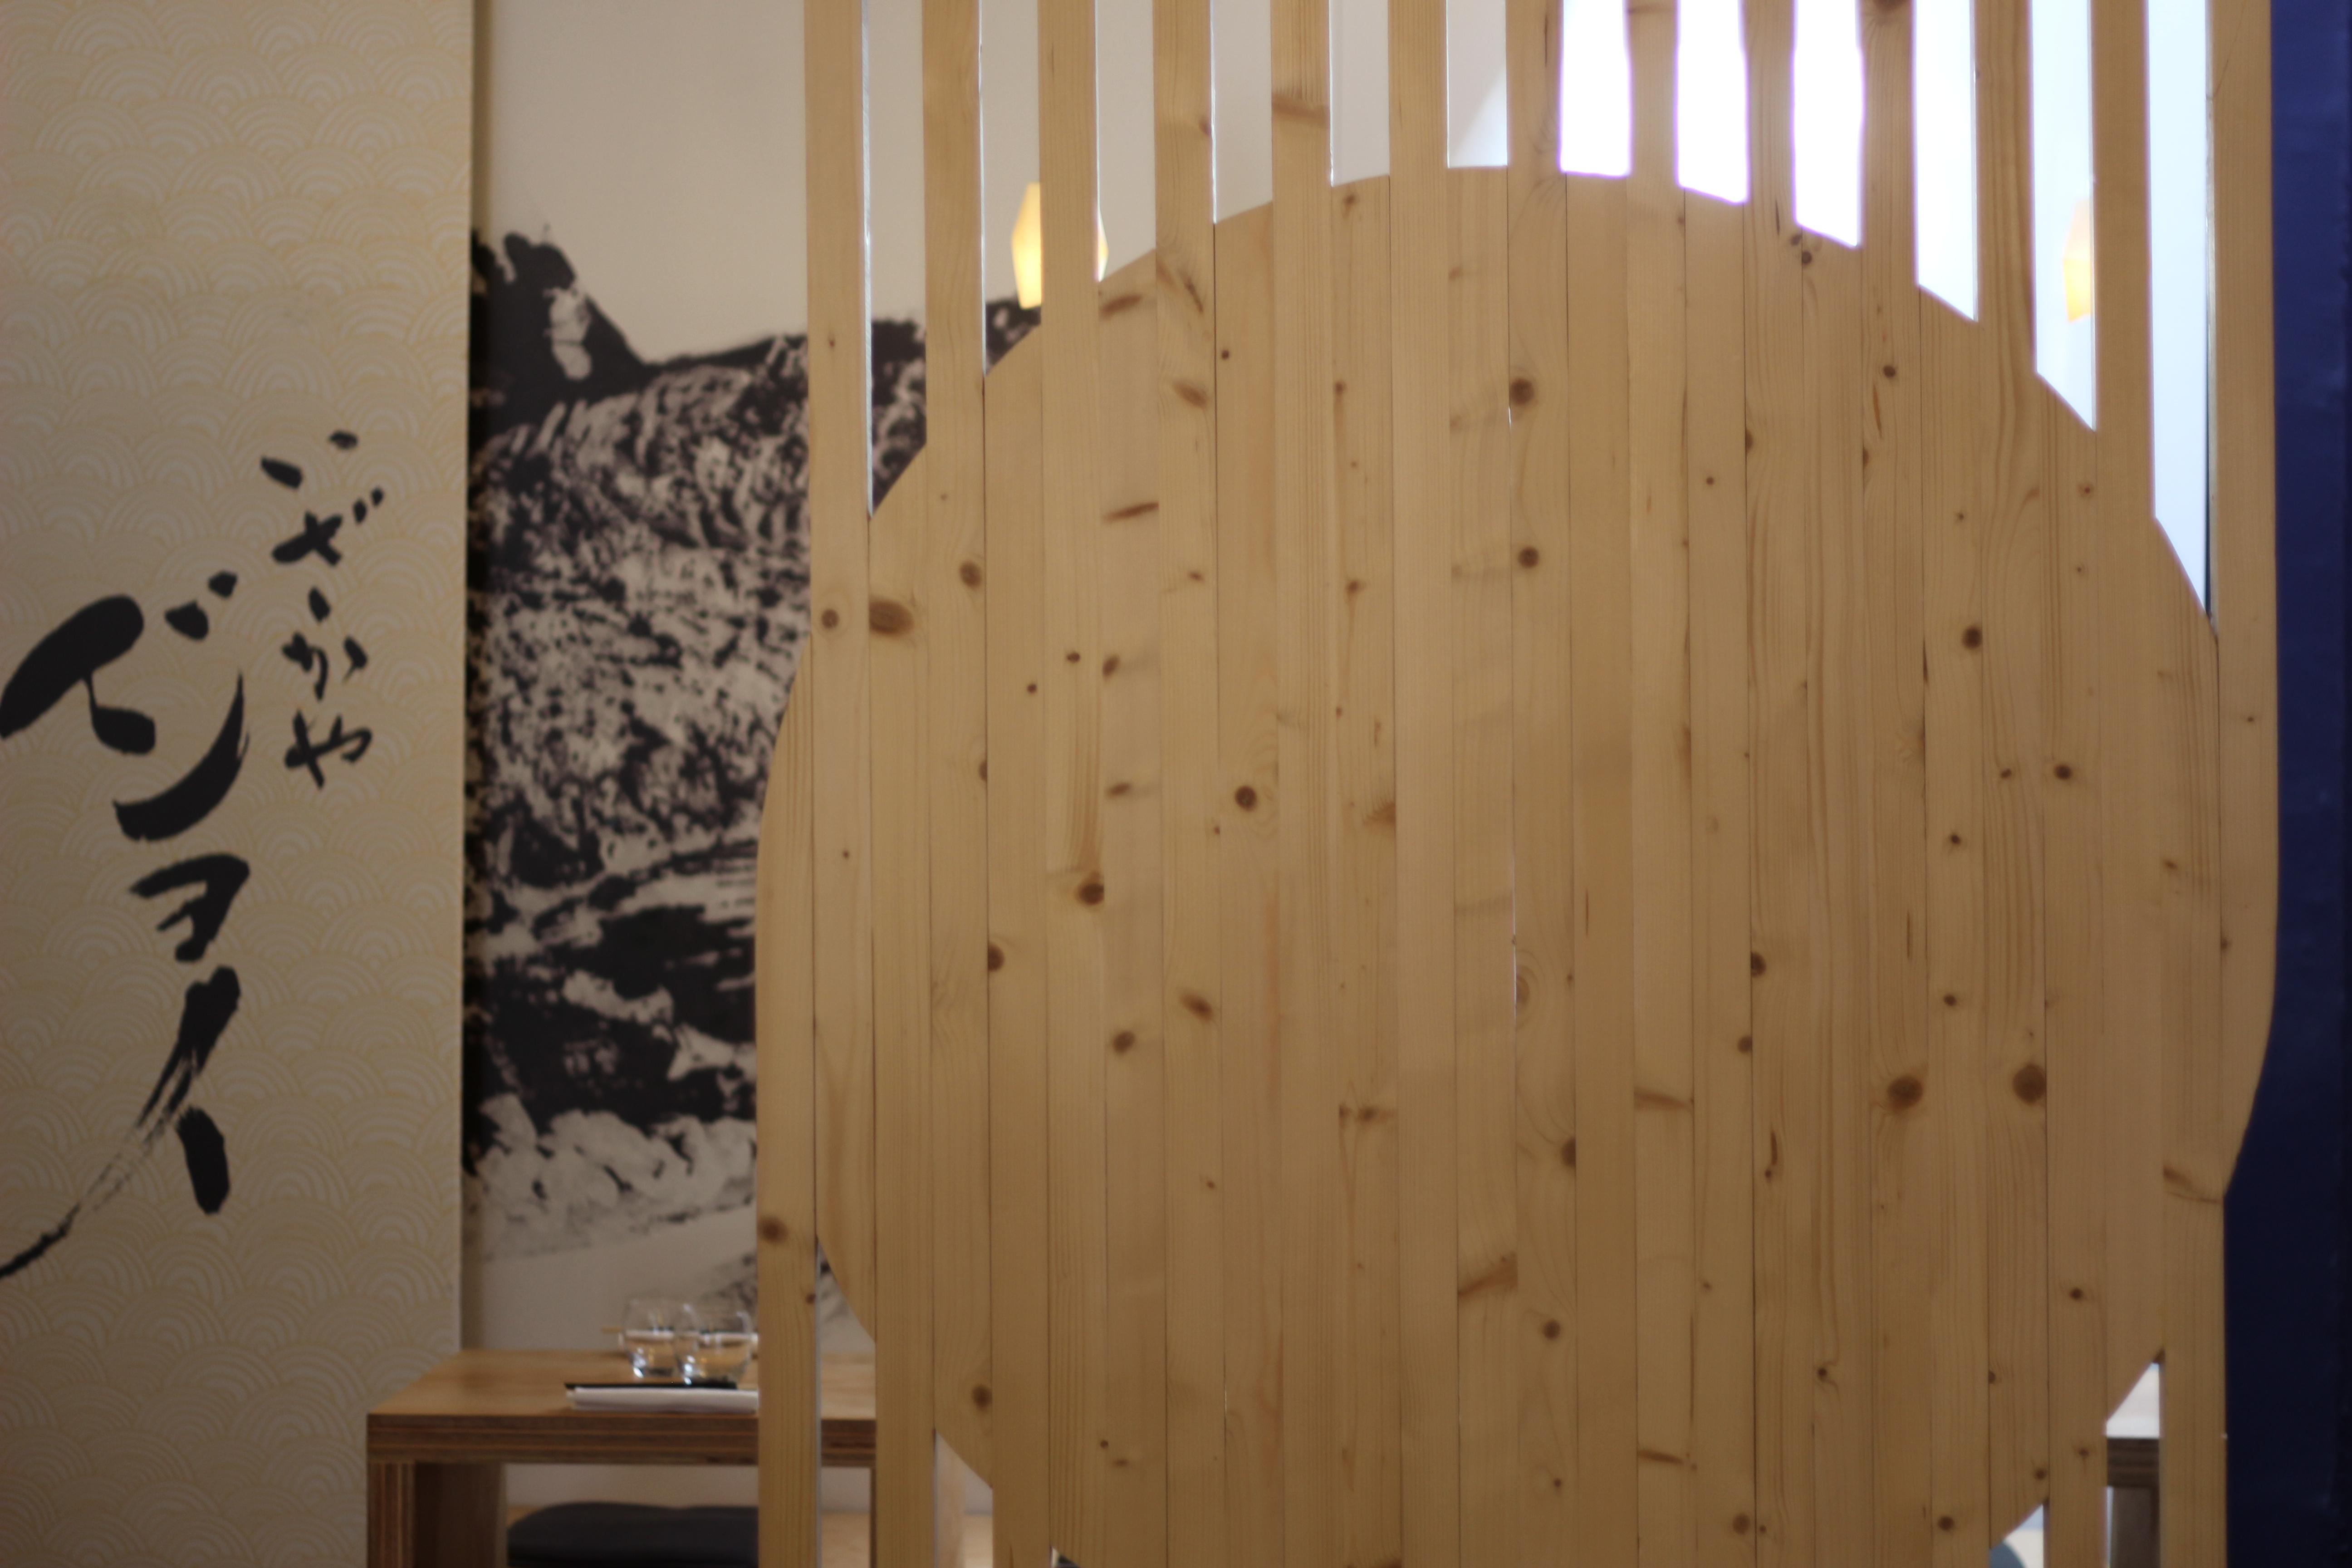 izakaya joyi restaurant japonais nantes girls n 39 nantes blog mode beaut et lifestyle. Black Bedroom Furniture Sets. Home Design Ideas